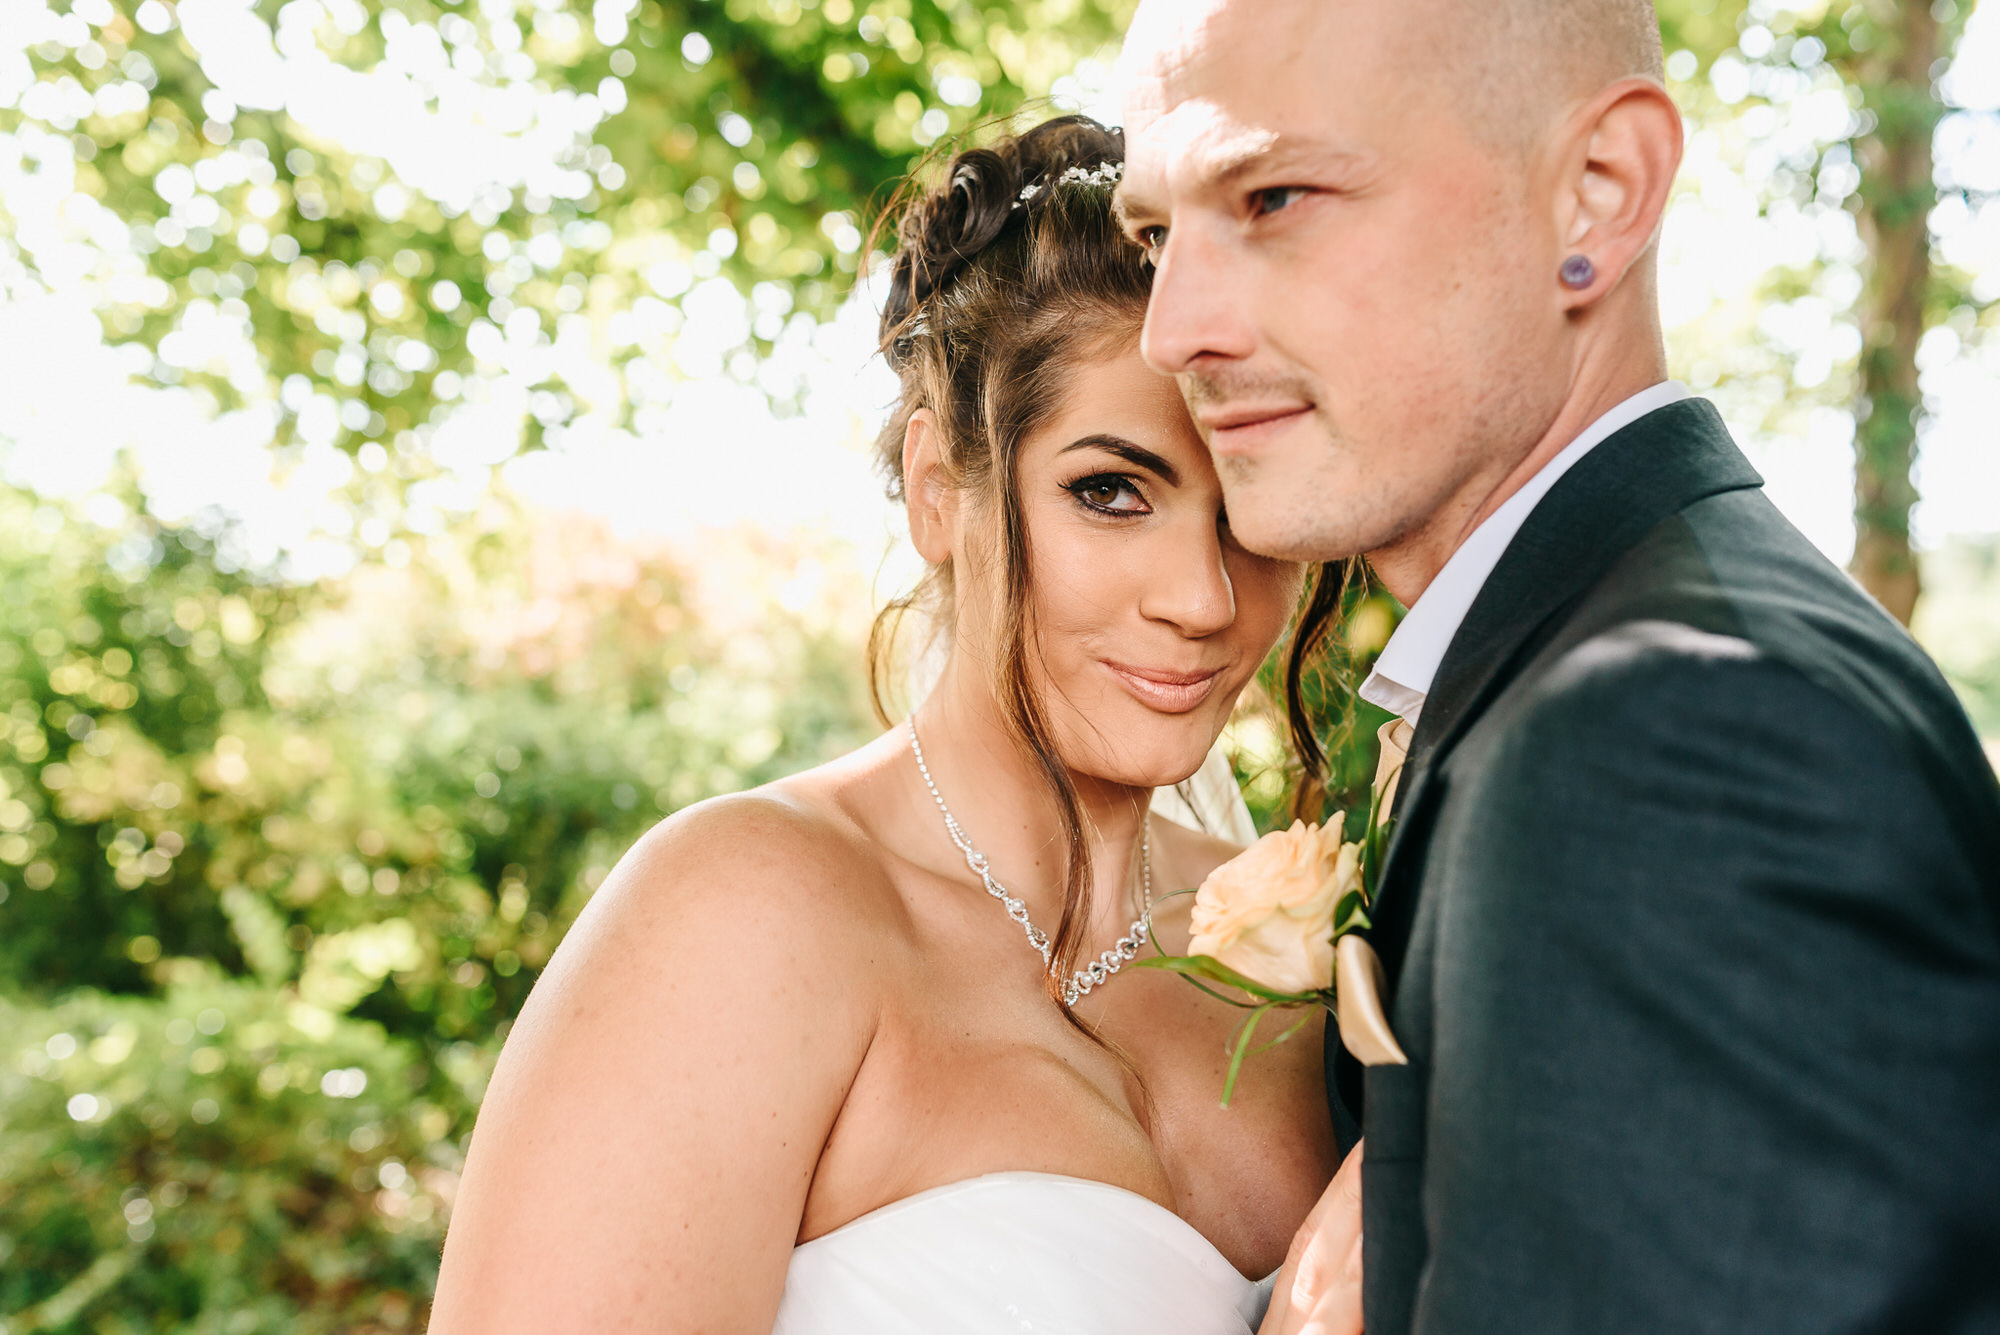 Best Of Yorkshire Wedding Photography 2017 - Martyn Hand-75.jpg